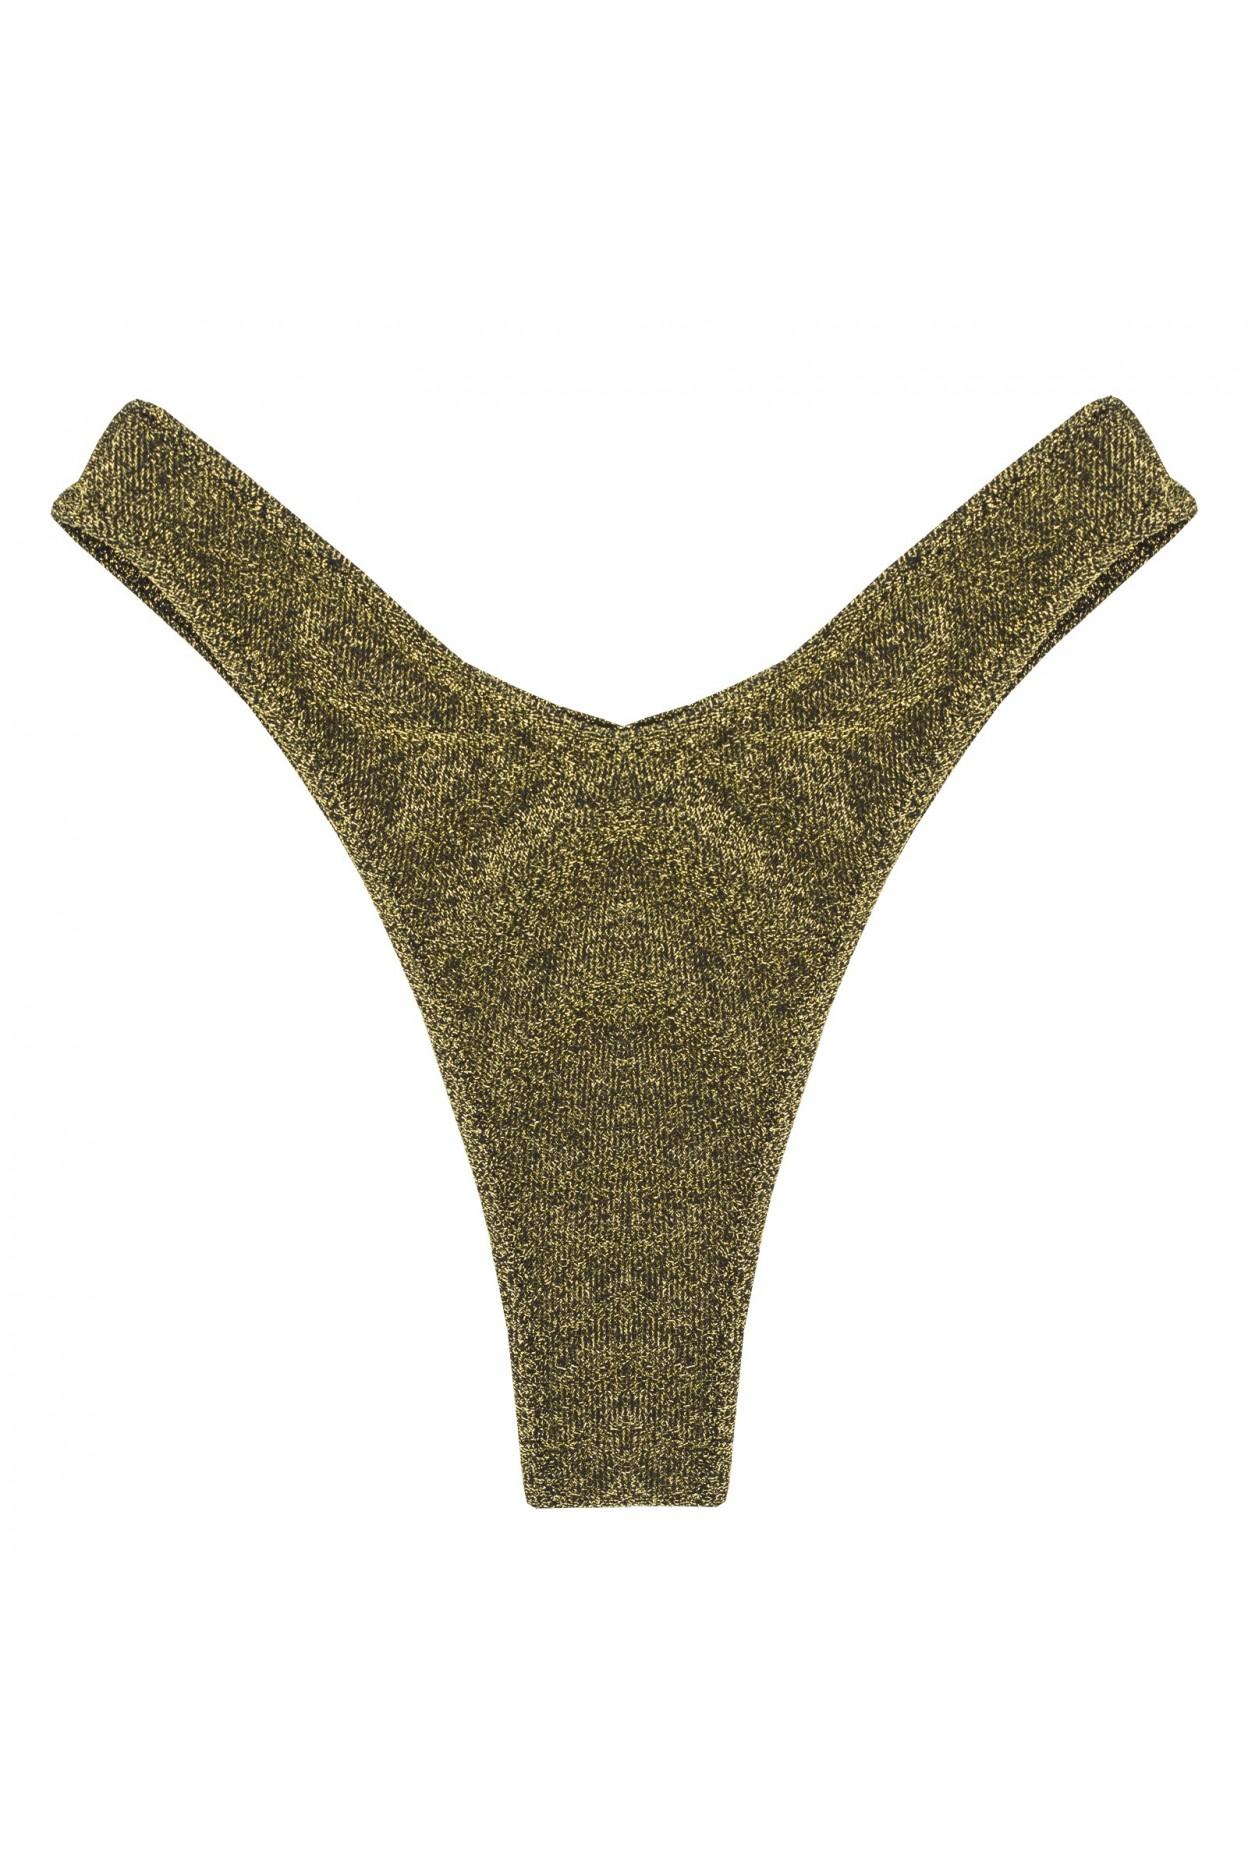 gliiter oro brasiliana costume donna